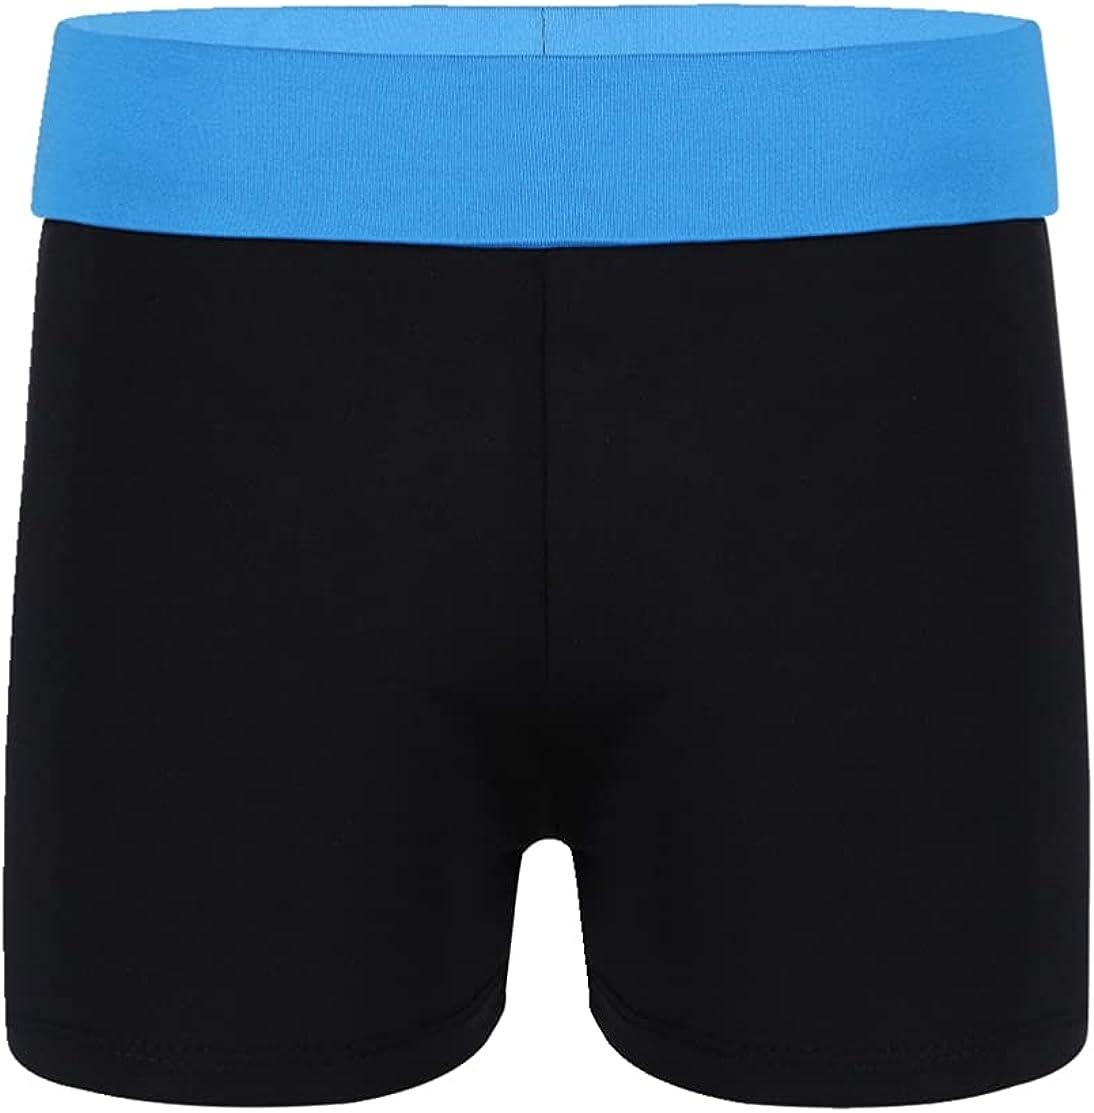 JEEYJOO Kids Girls Elastic Waistband Sports Workout Activewear Shorts Gymnastic Swimming Bottoms